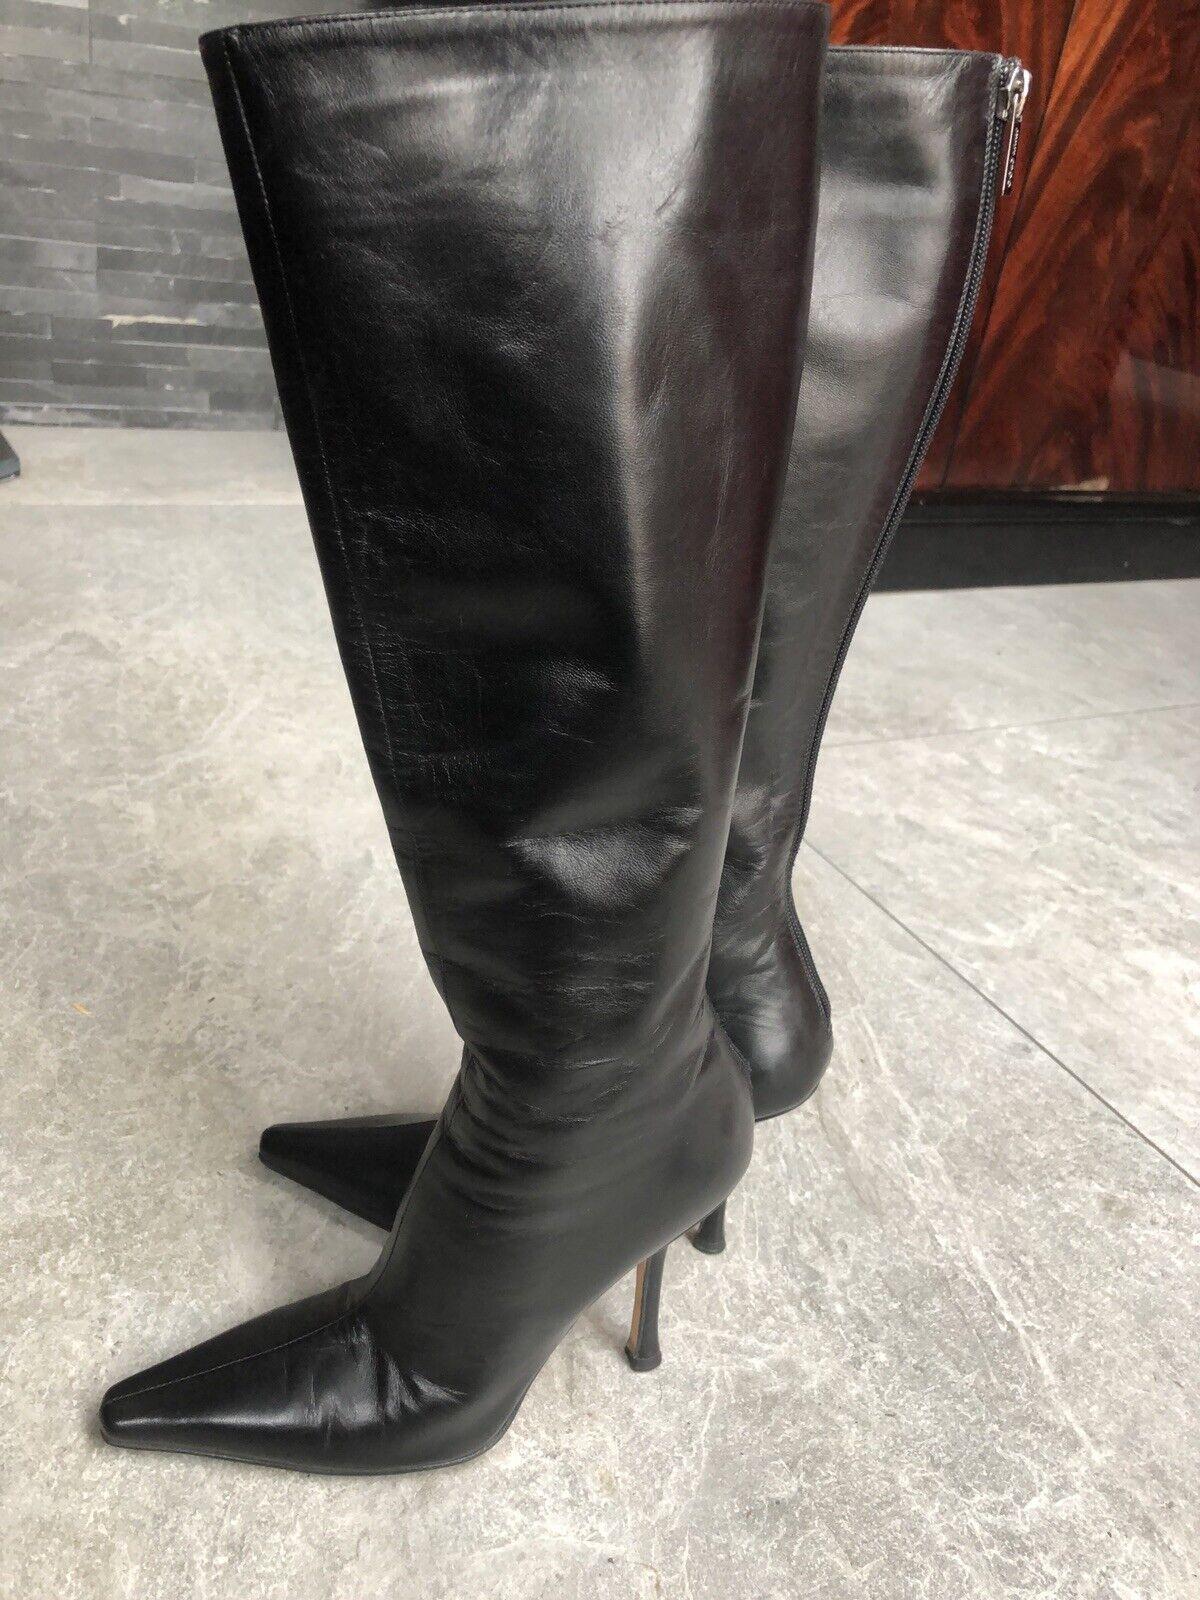 Jimmy choo boots Size 34.5 UK 2.5